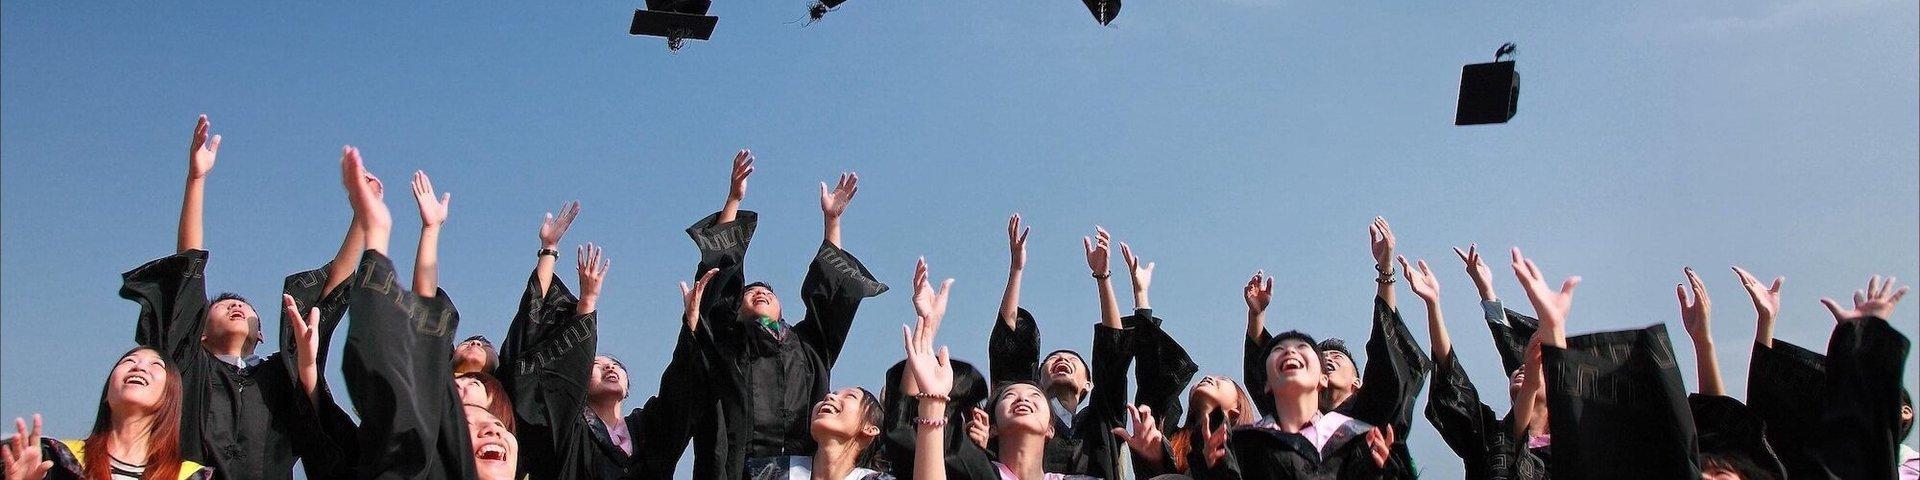 Graduation Limo Service San Diego